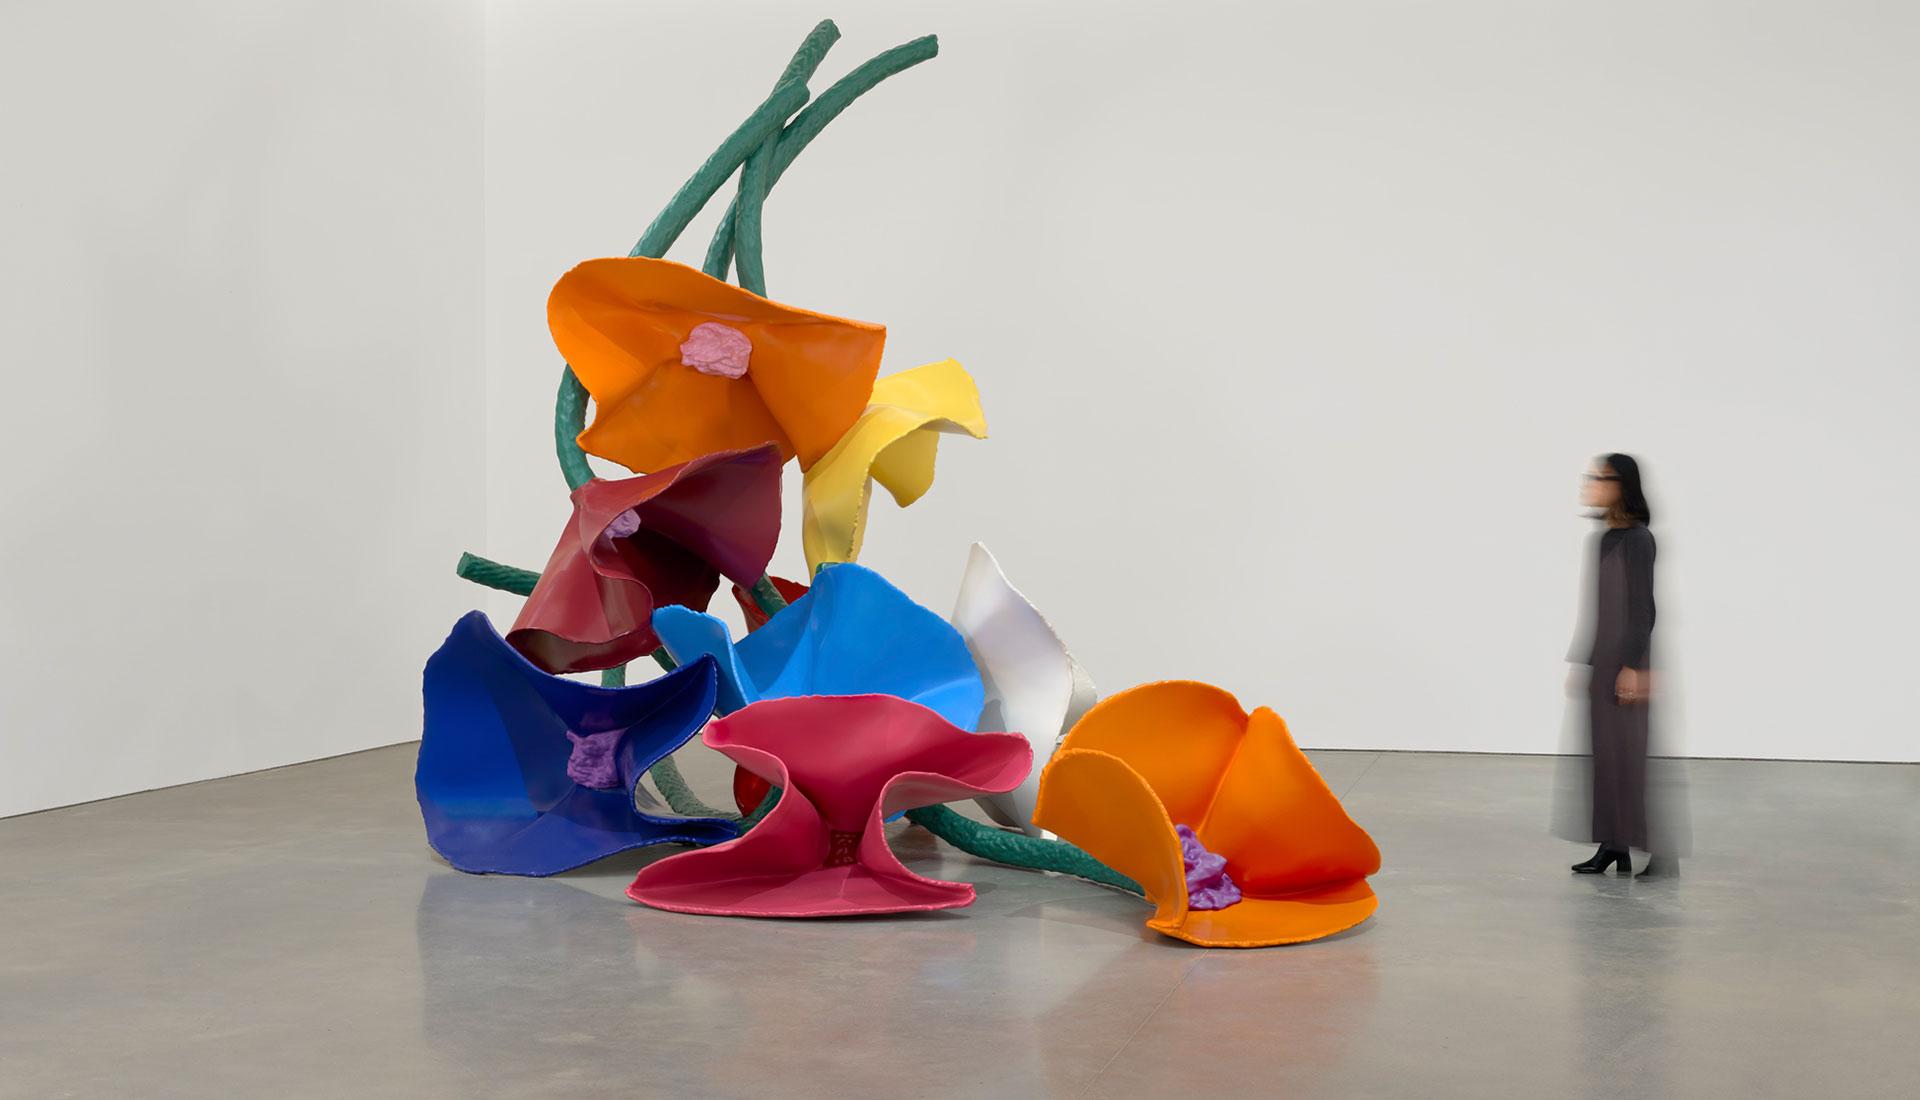 Pace Gallery: ретроспектива скульптур Класа Олденбурга и Косье ван Брюгген